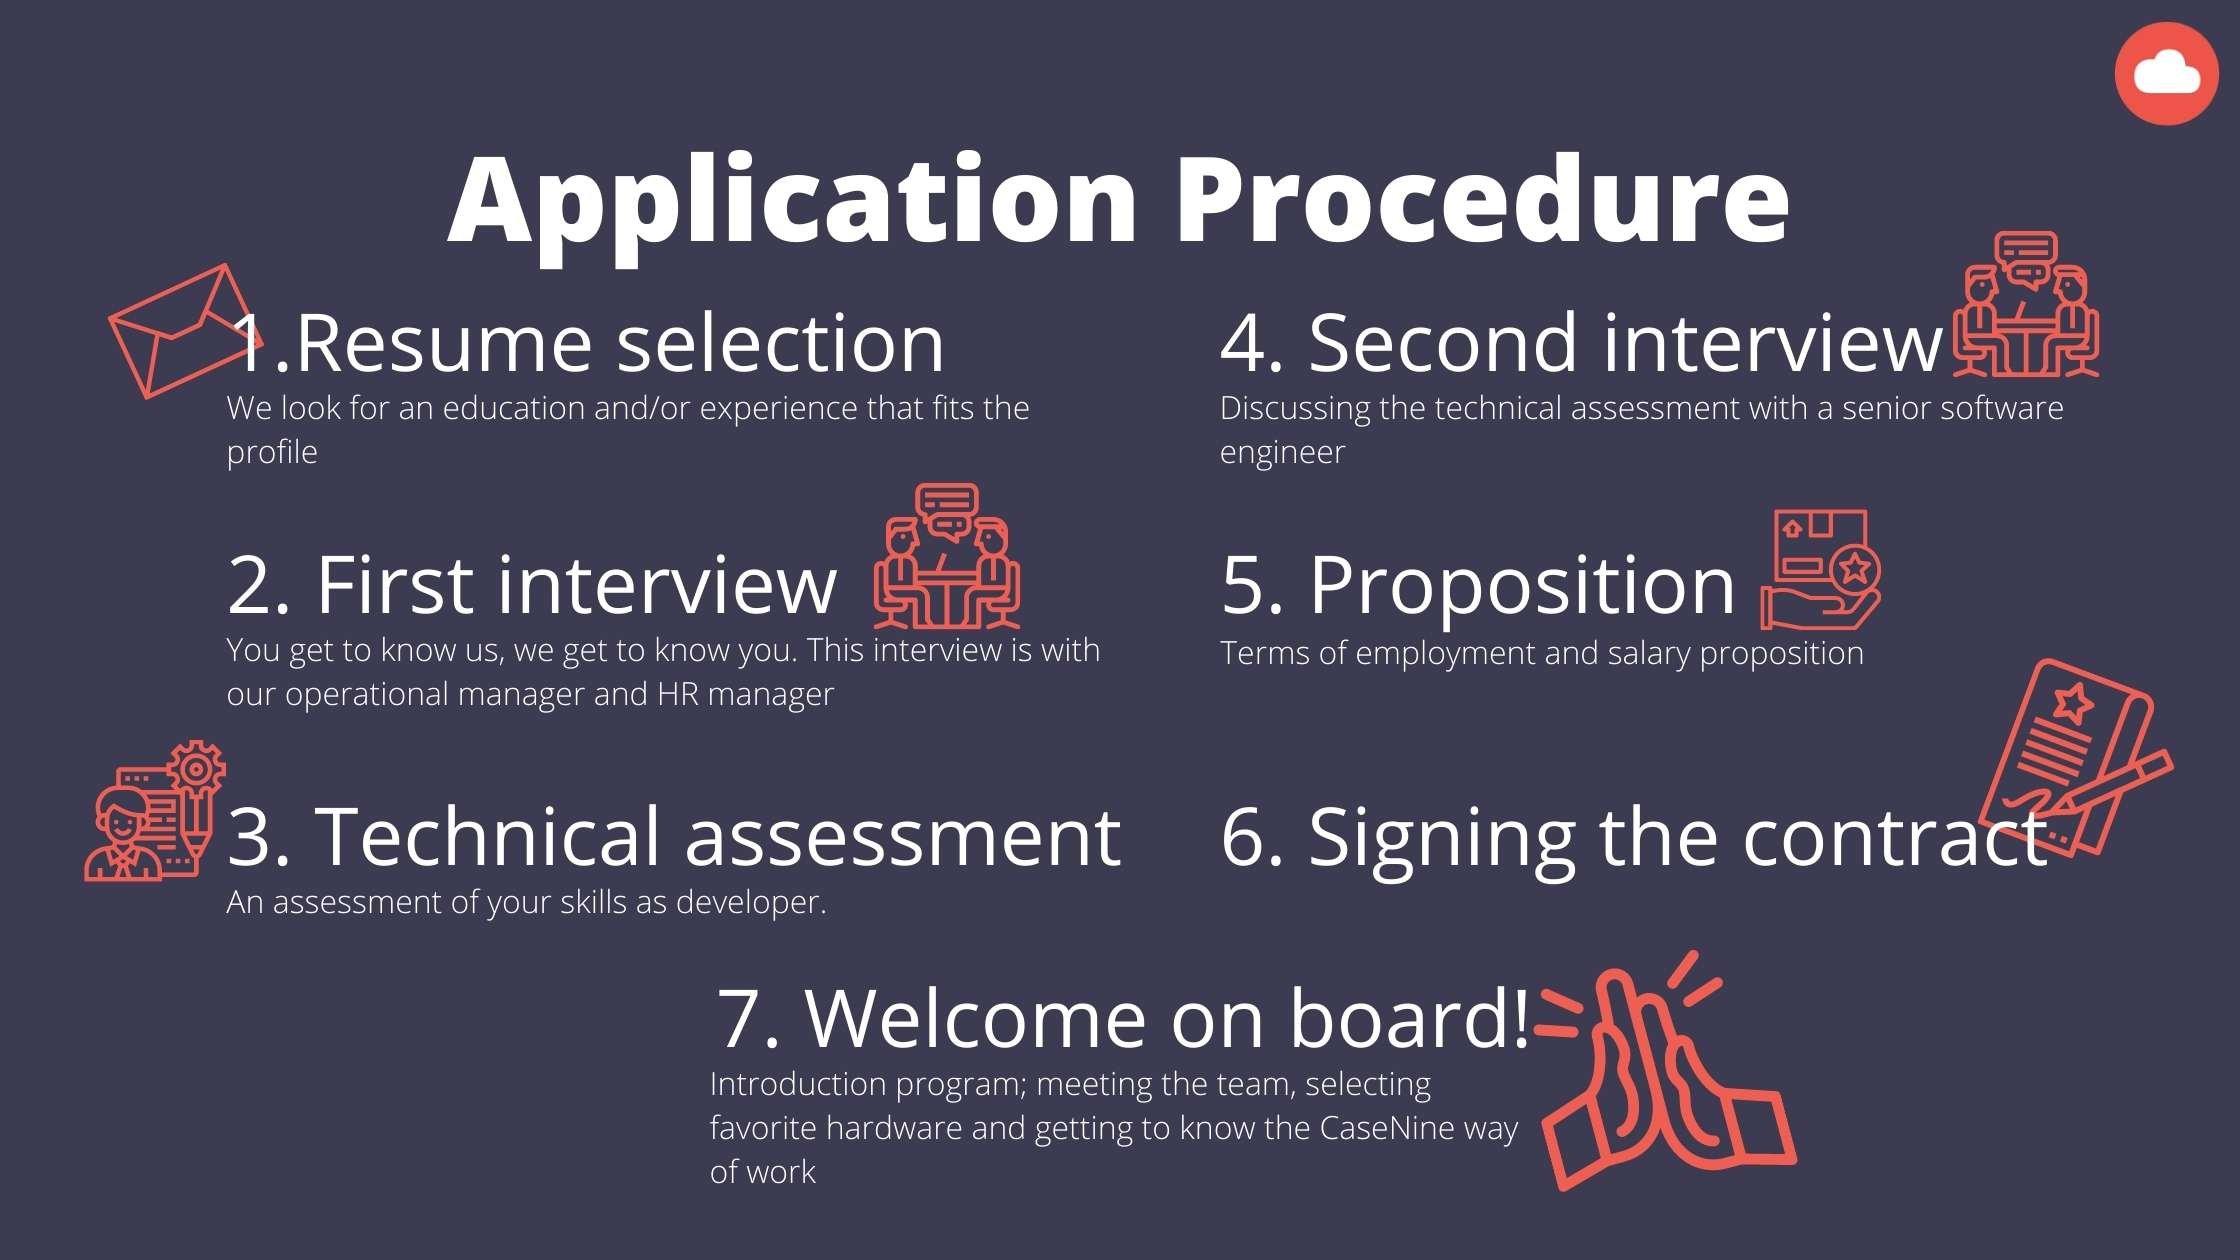 Application Procedure